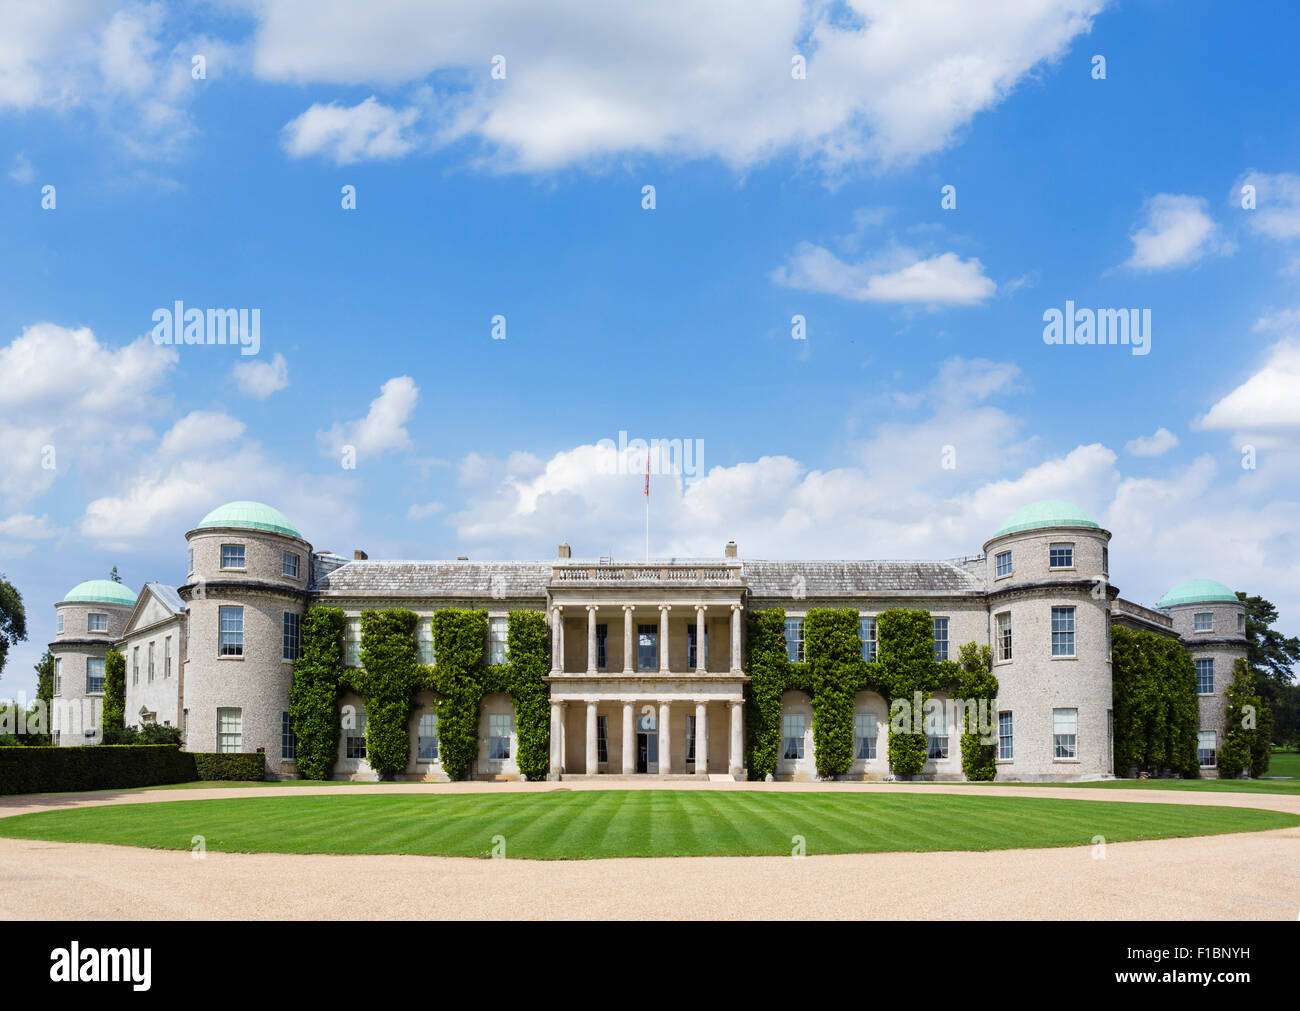 Goodwood House, West Sussex, England, UK Stockbild